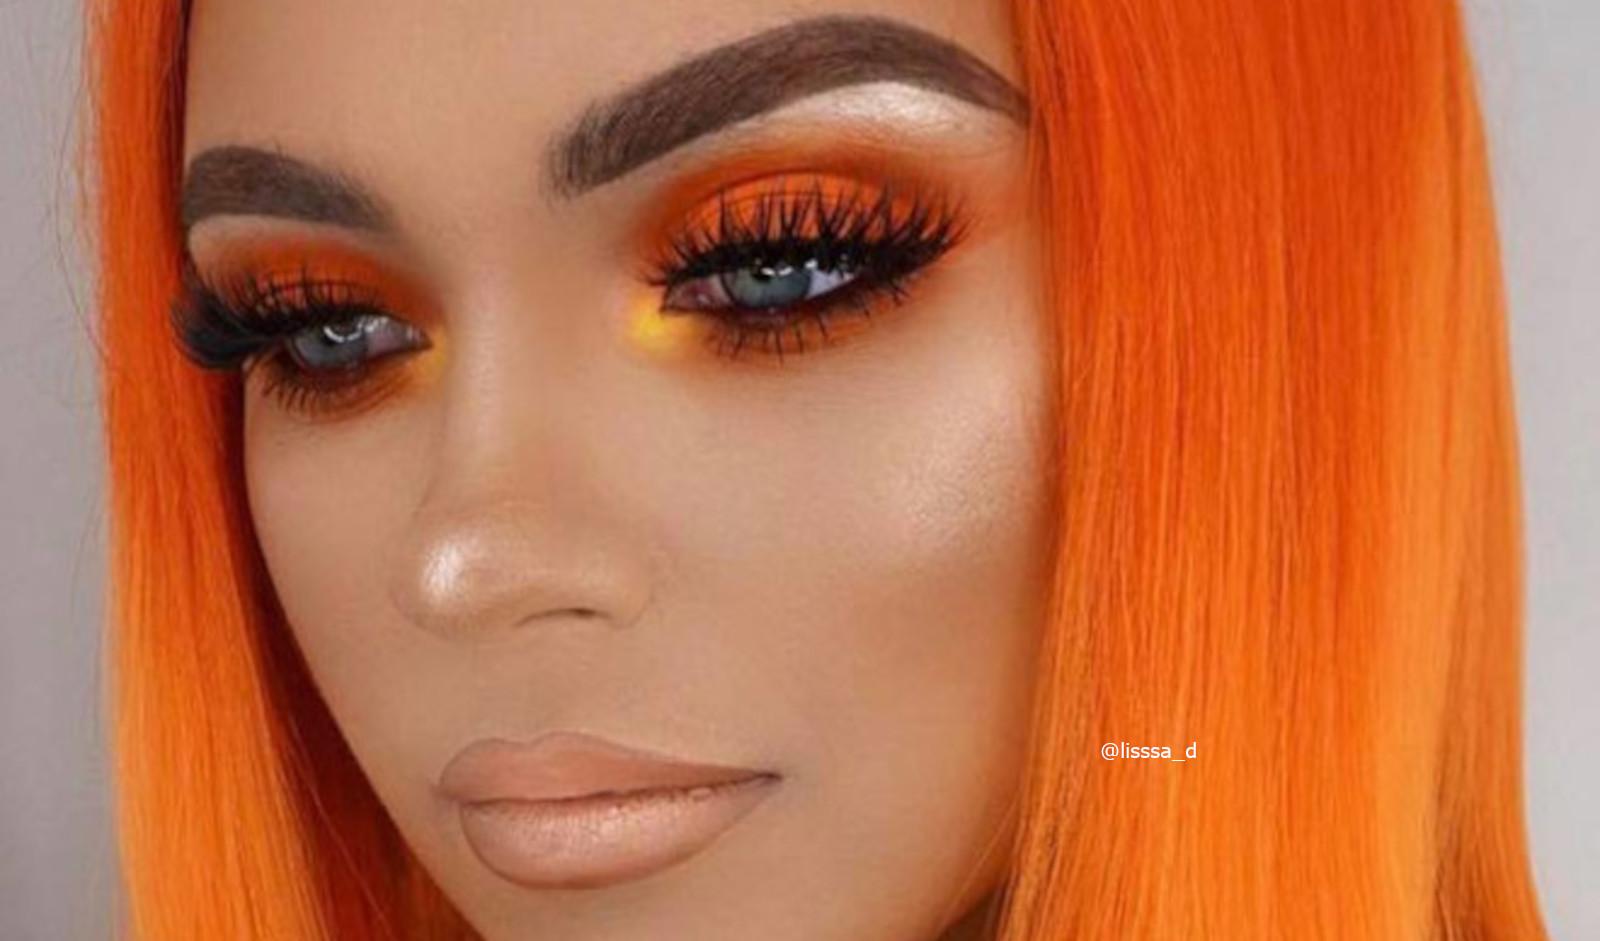 Fall Orange Makeup Looks To Match Your Pumpkin Spice Latte